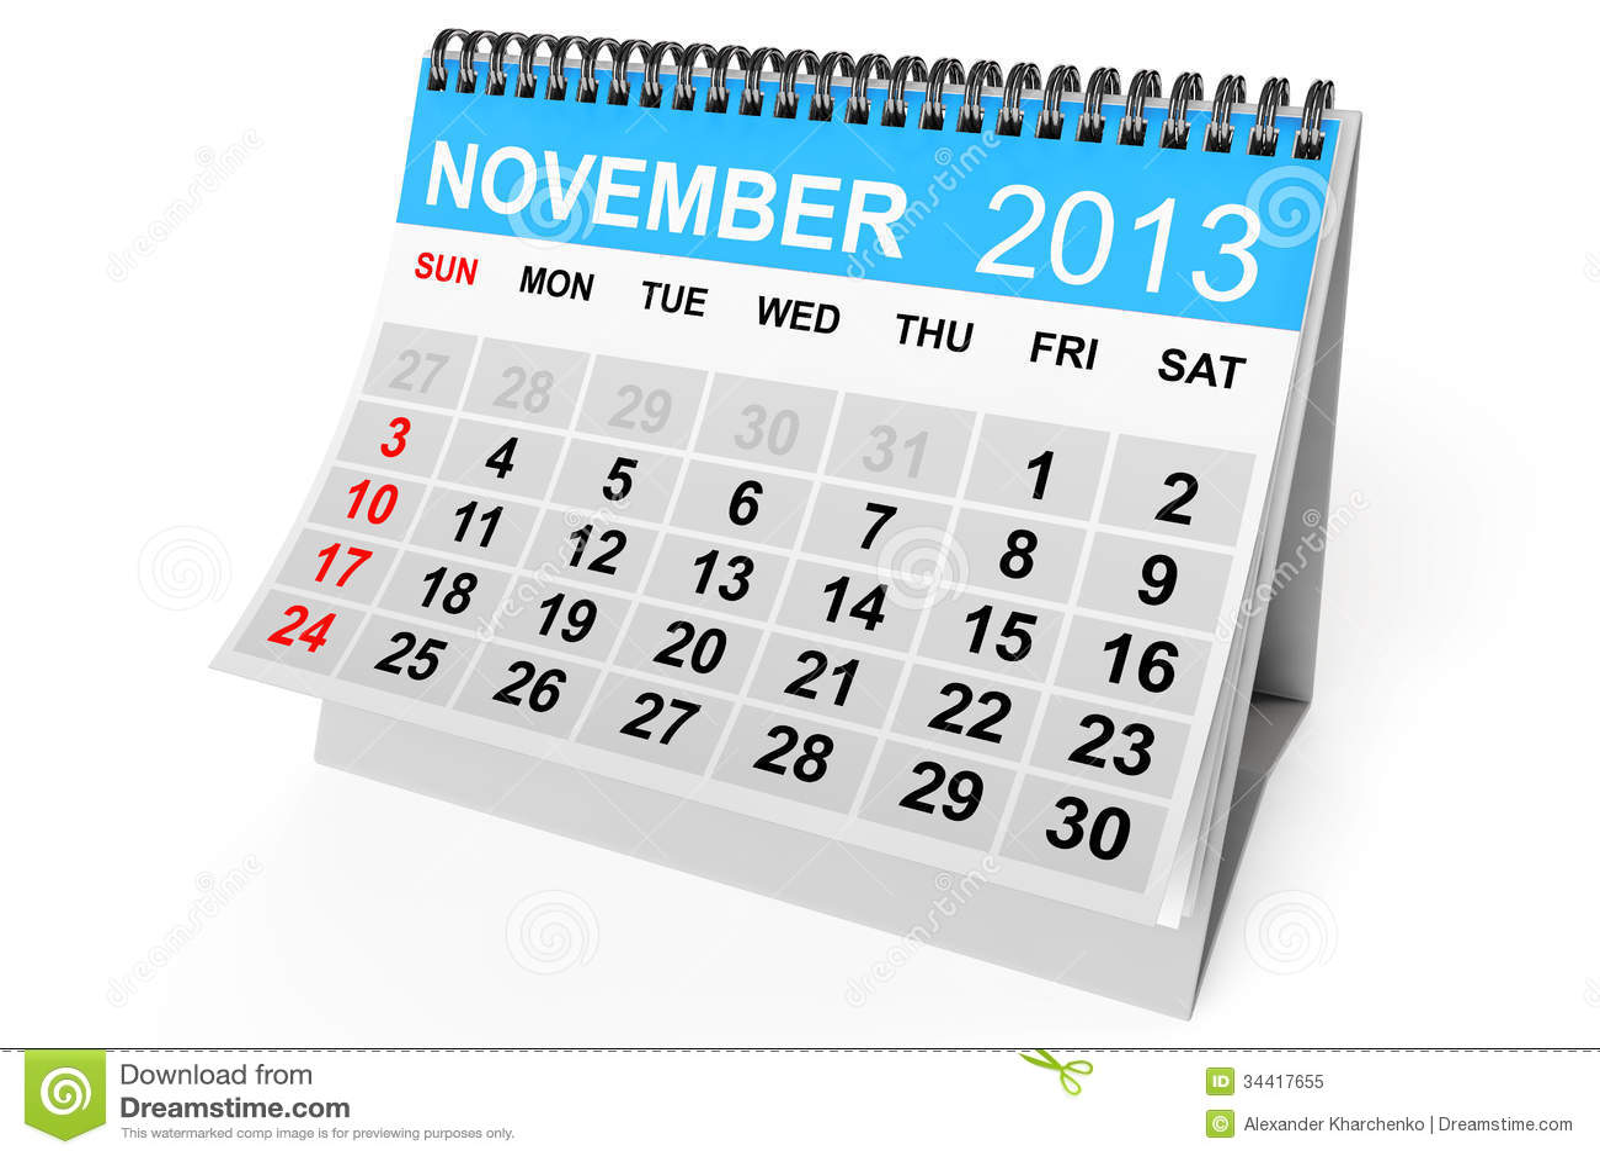 calendar november 2013 stock illustration illustration of date